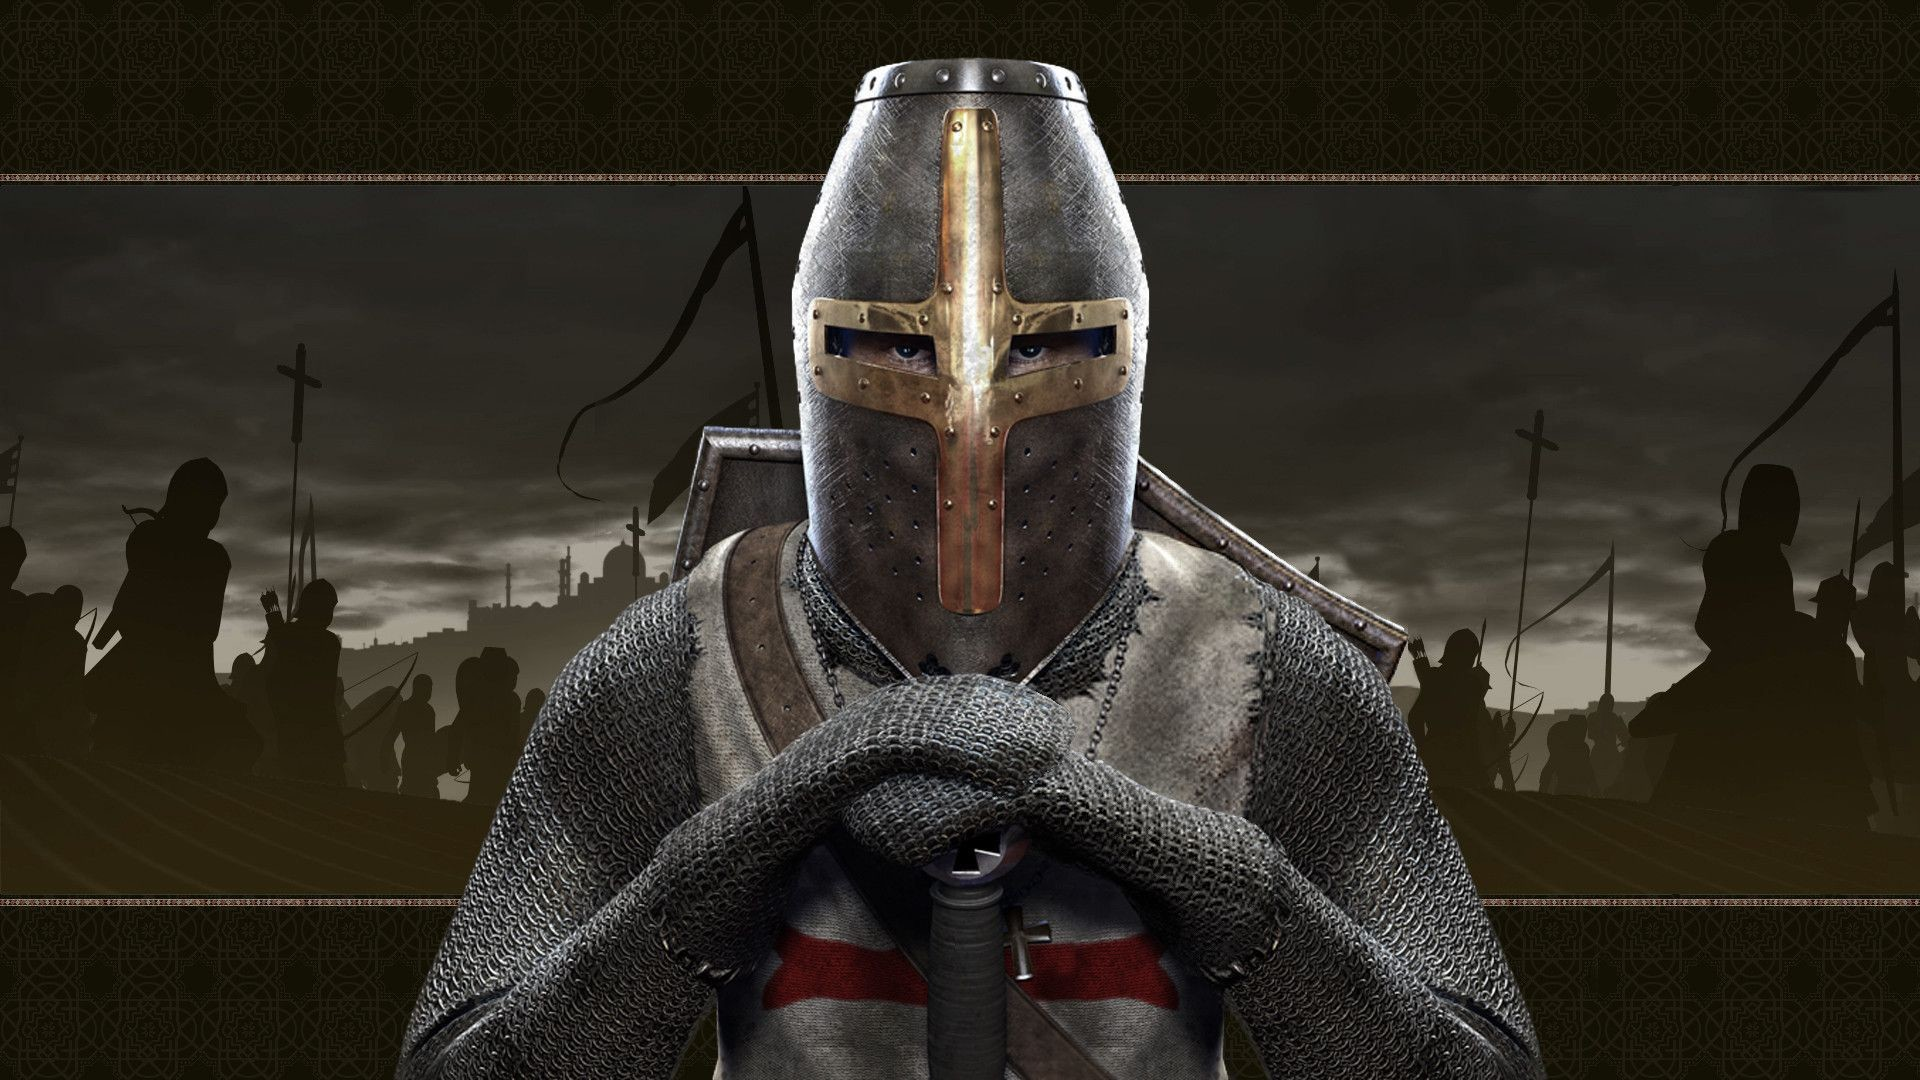 Res: 1920x1080, Knights Templar Wallpapers Wallpaper